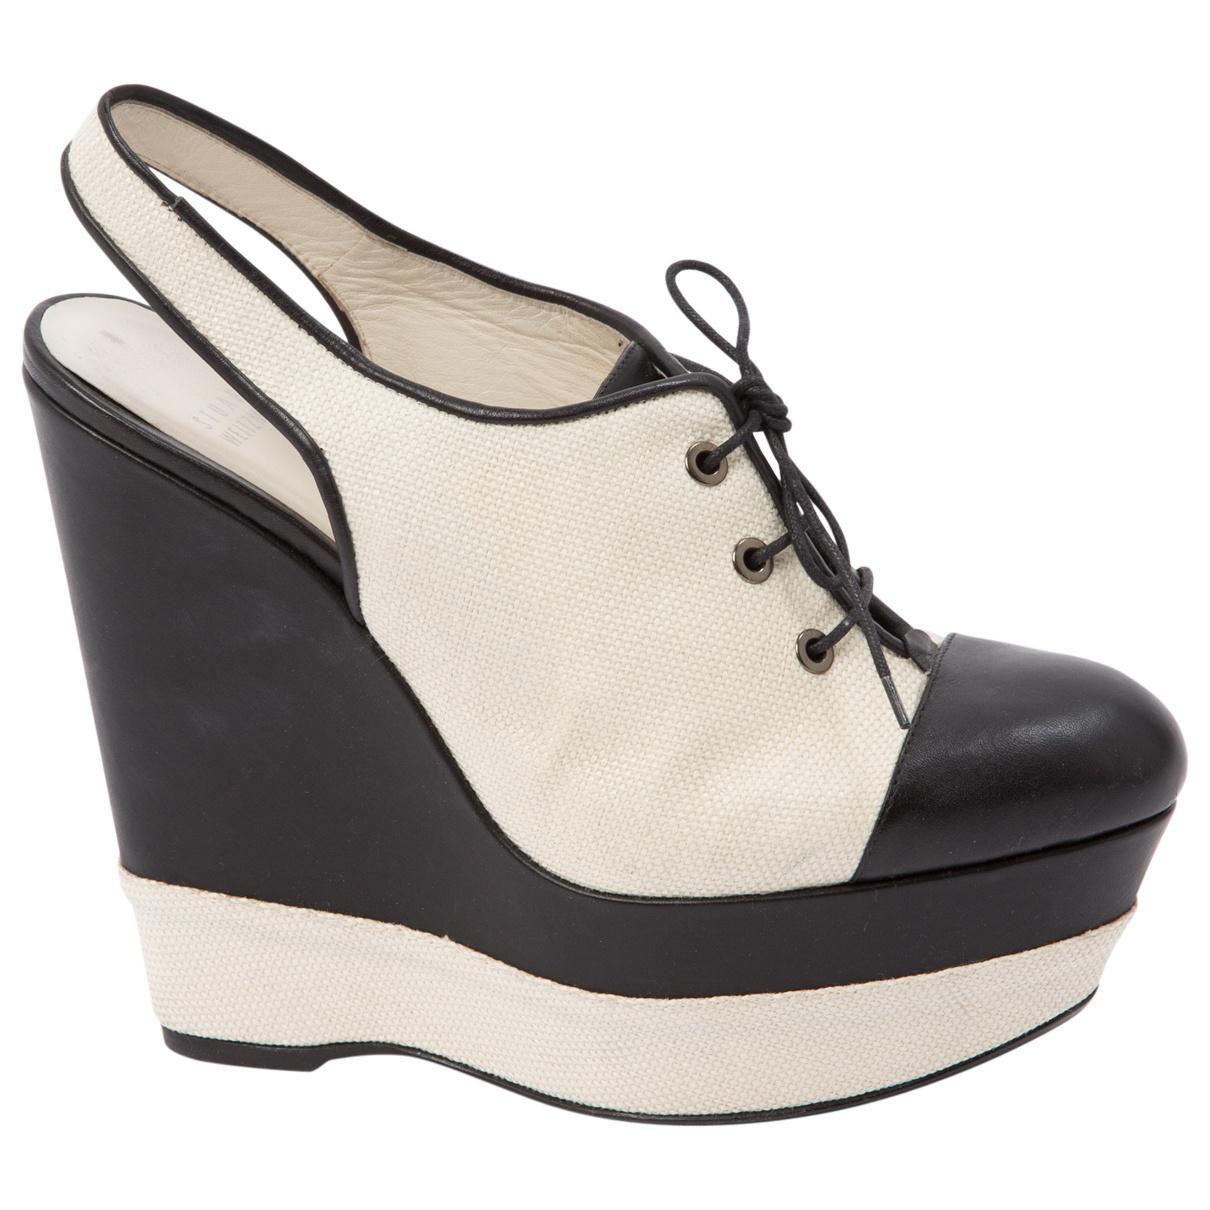 Pre-owned - Cloth heels Stuart Weitzman j6wBYFCEU